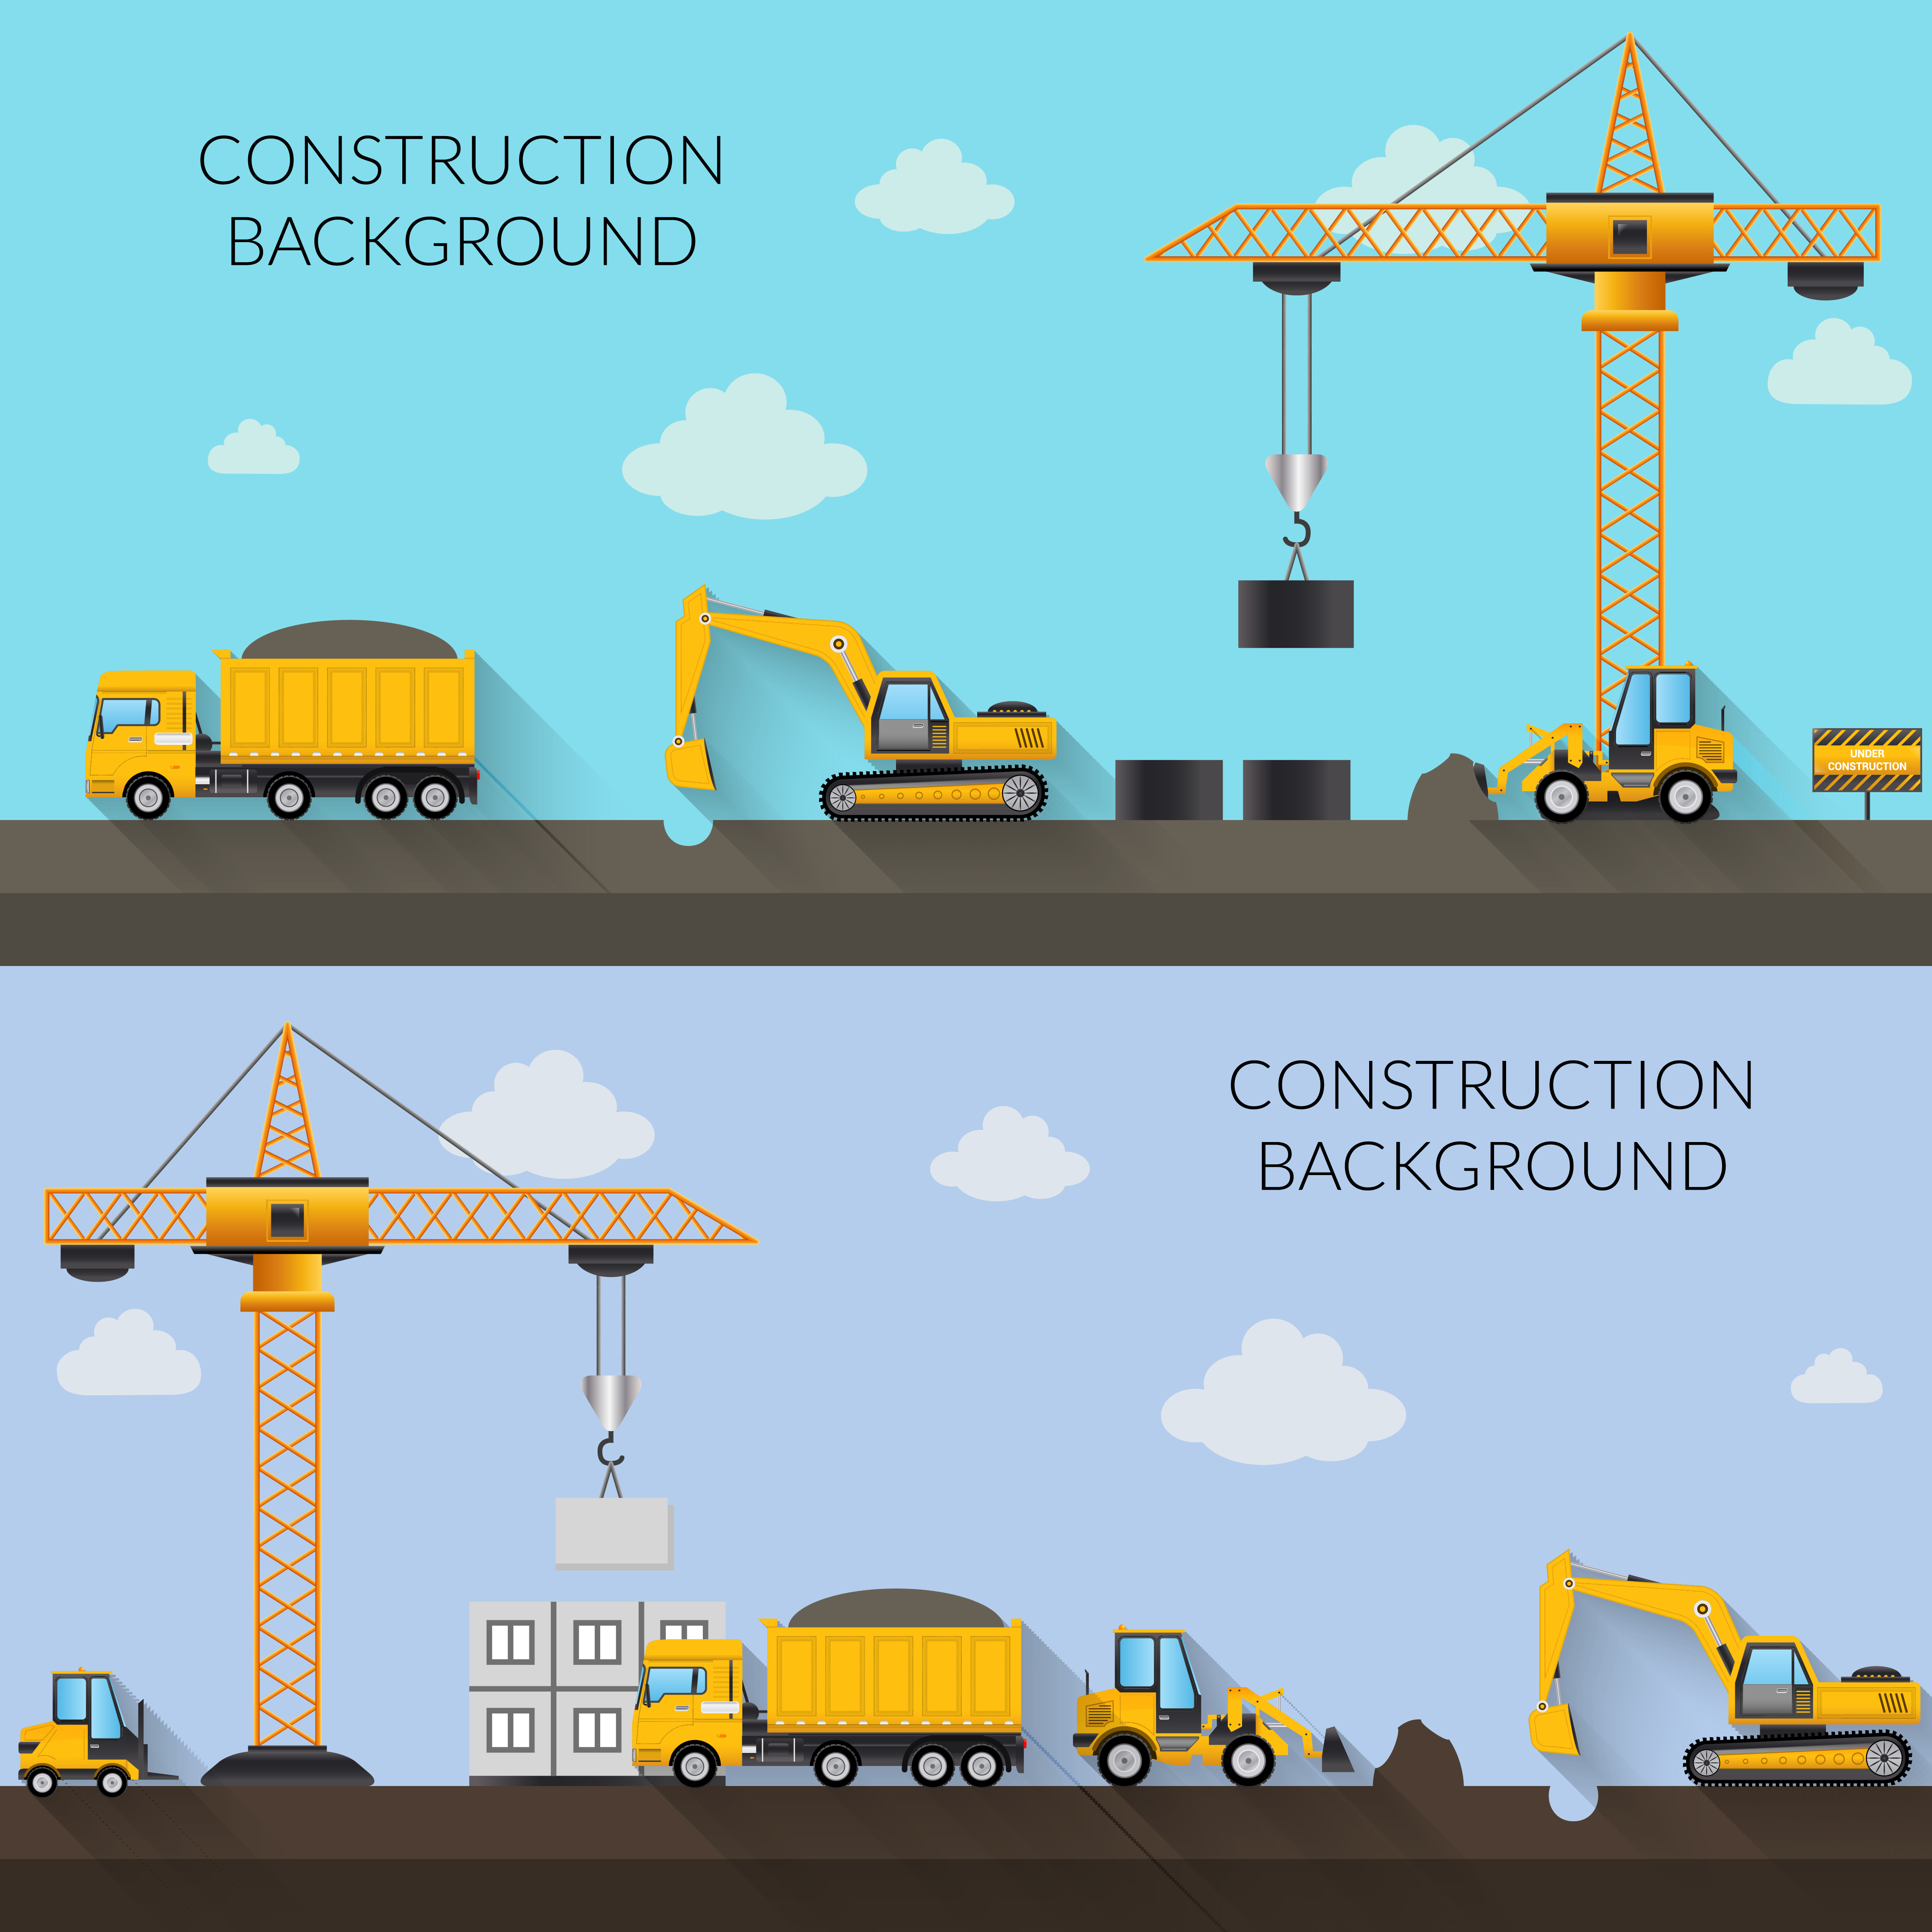 Construction Background Illustration - Download Free ...